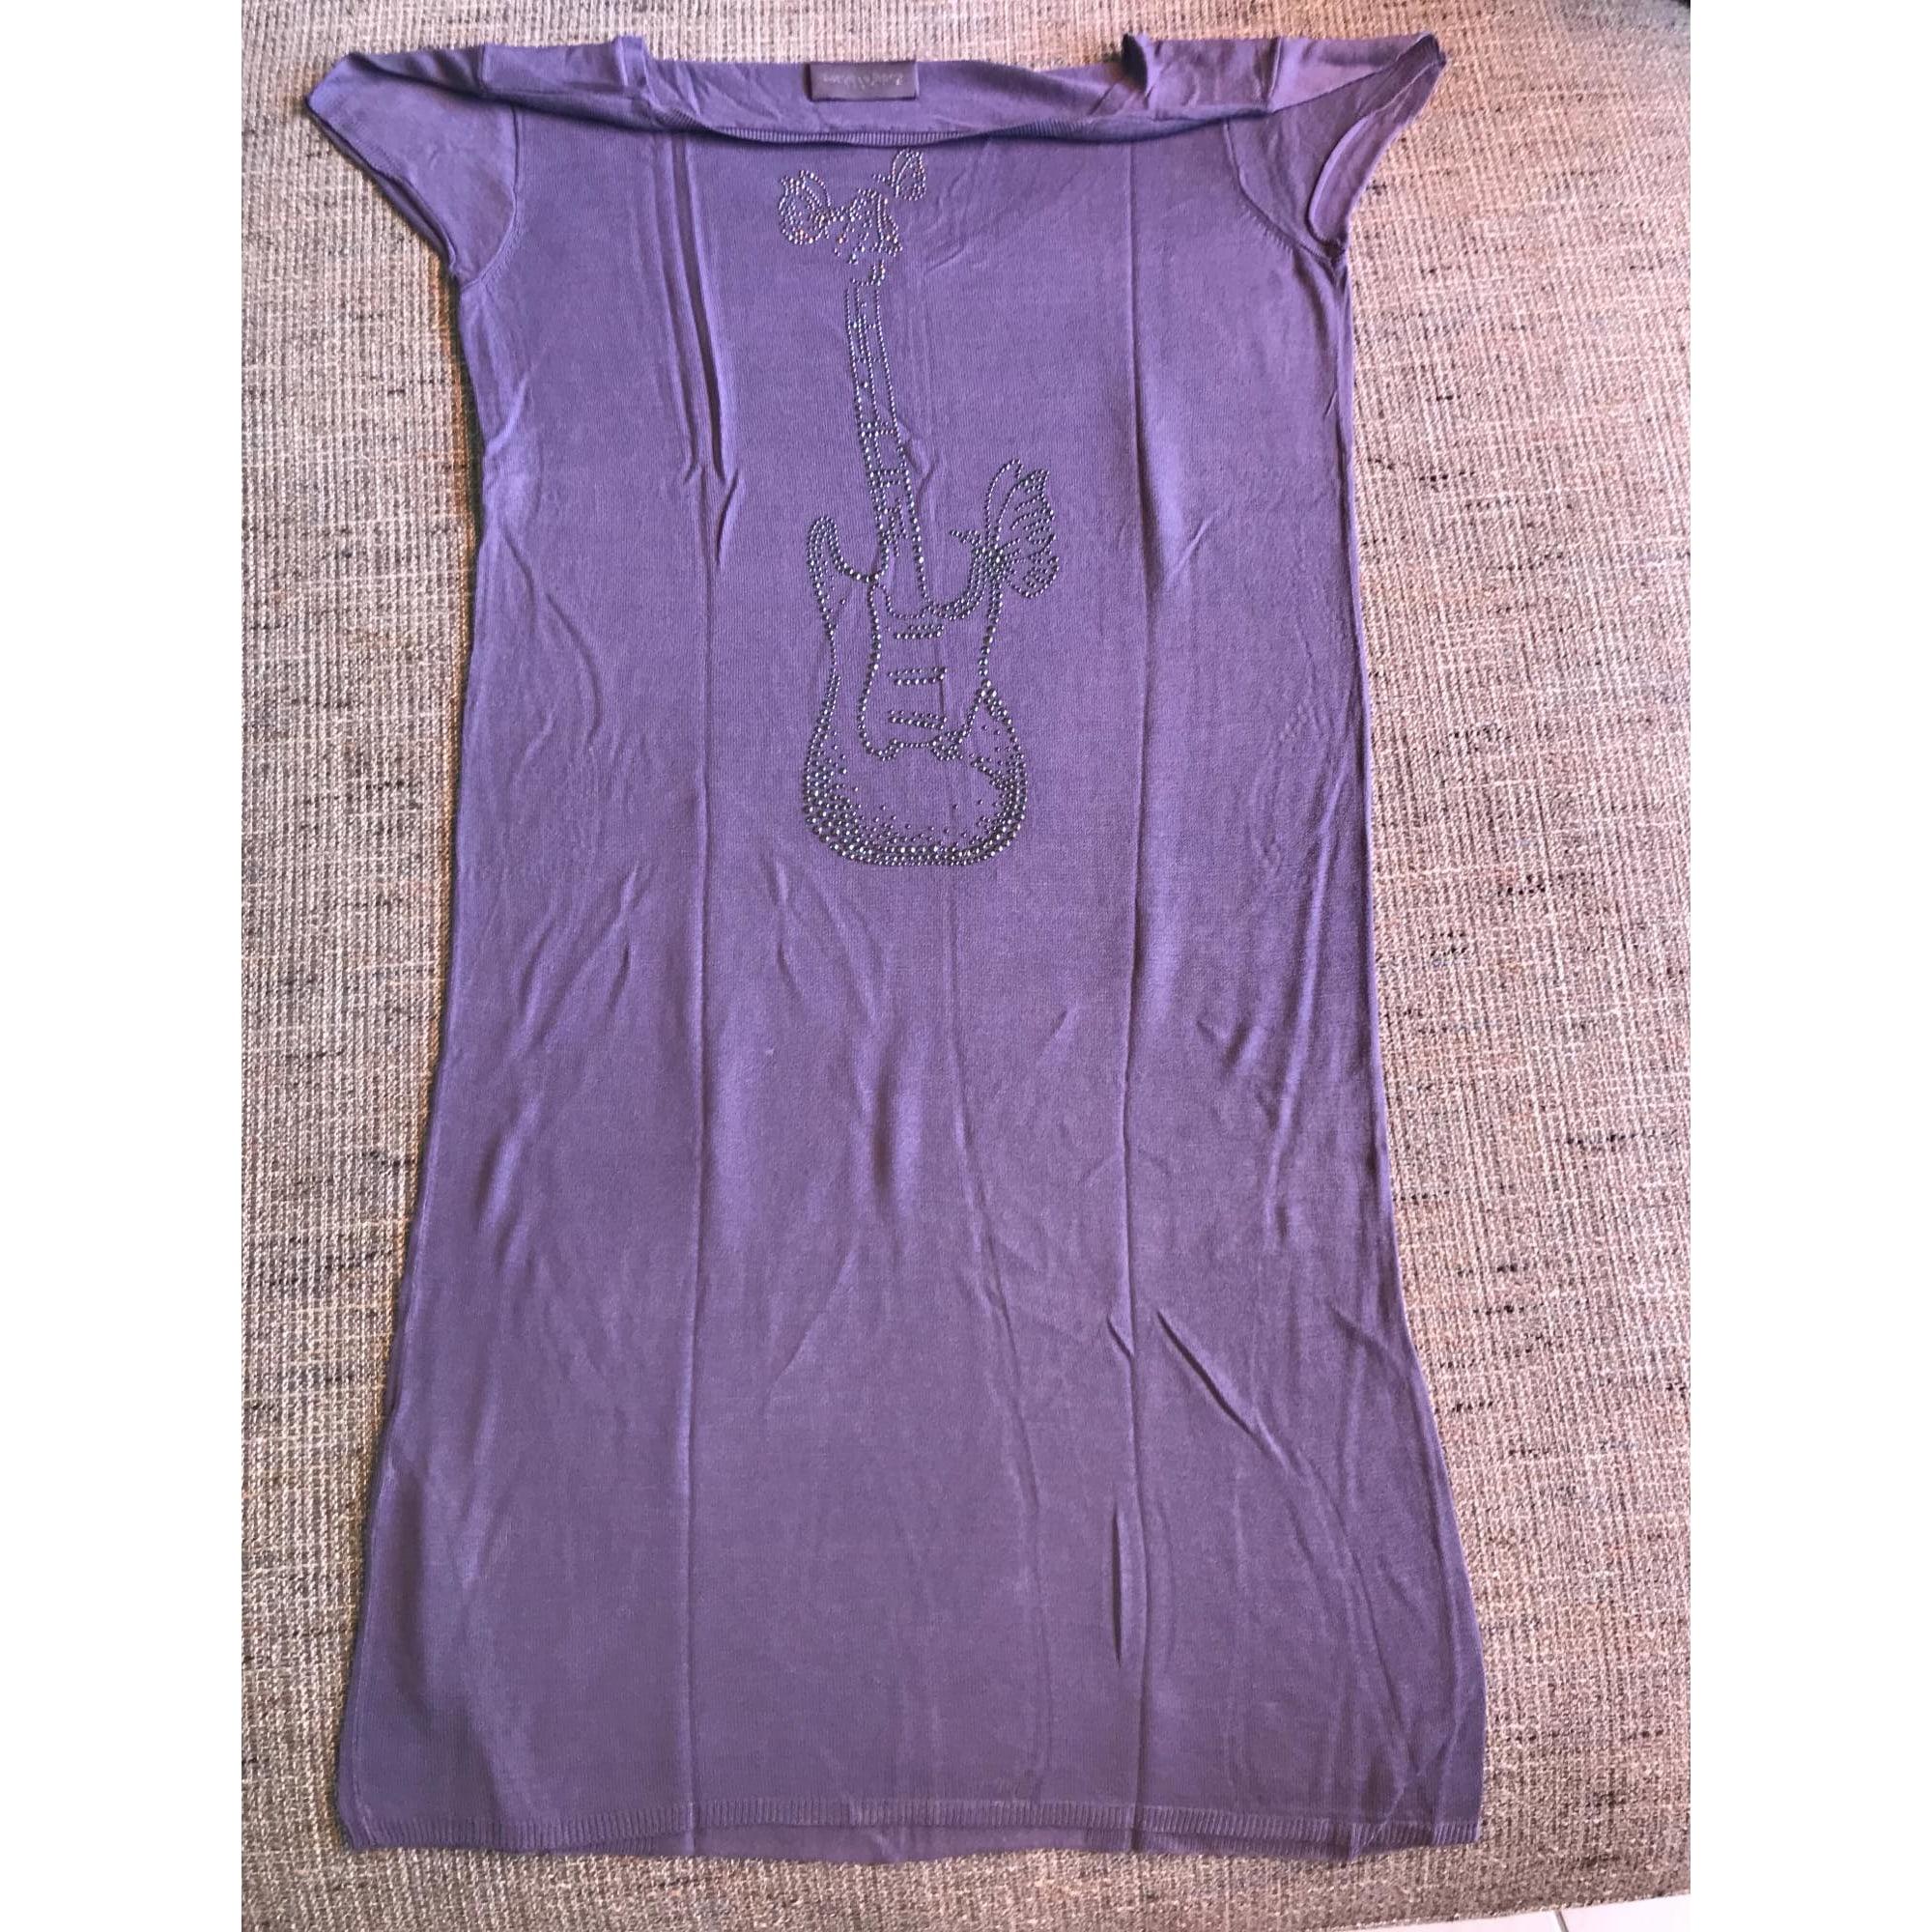 Robe courte ZADIG & VOLTAIRE Violet, mauve, lavande